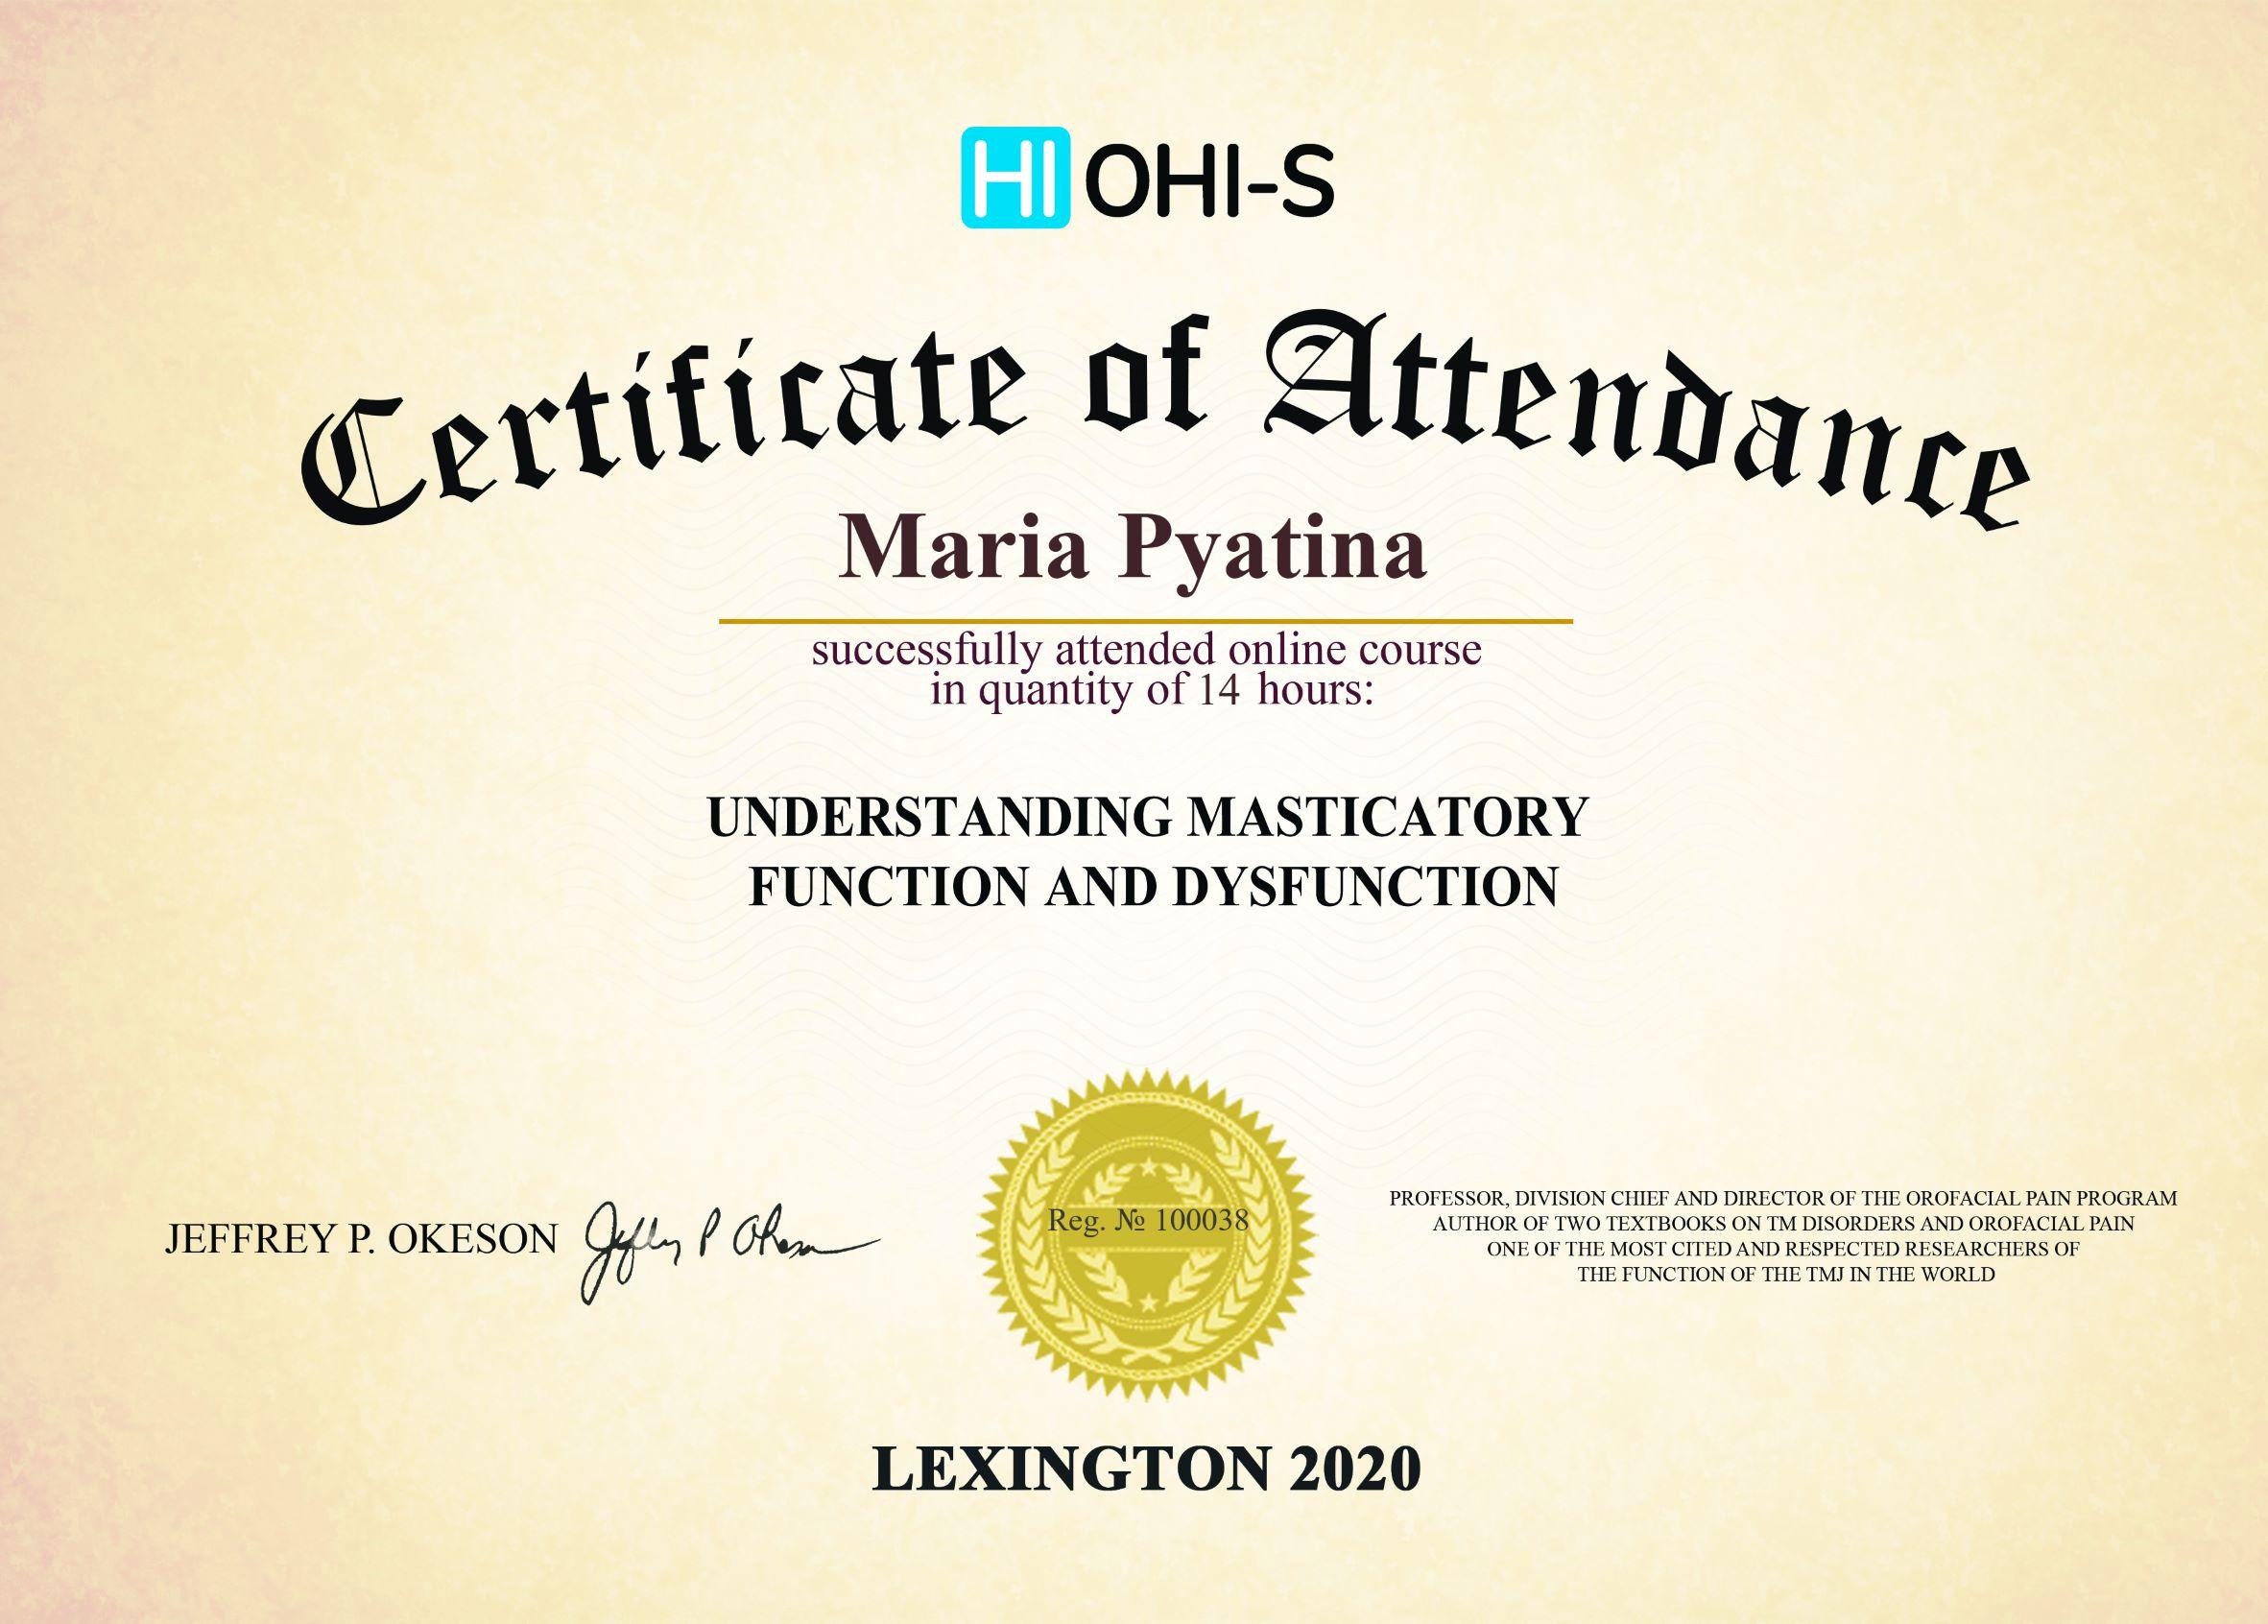 2020, HI OHI-S, Lexington